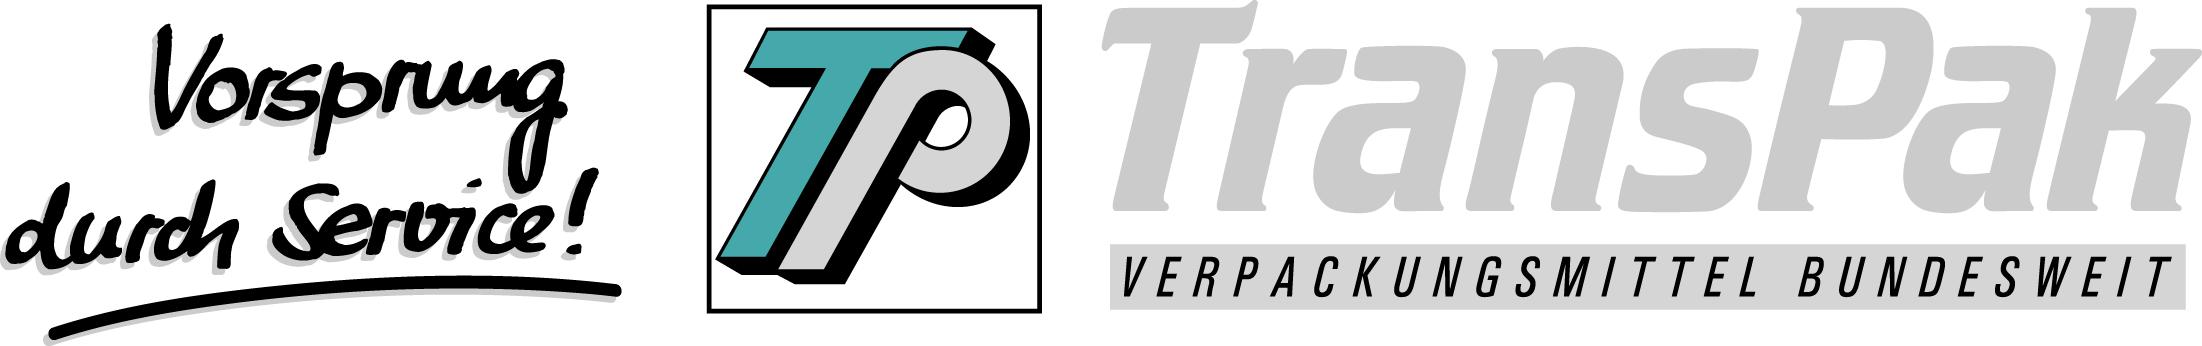 Logo 90c40y new